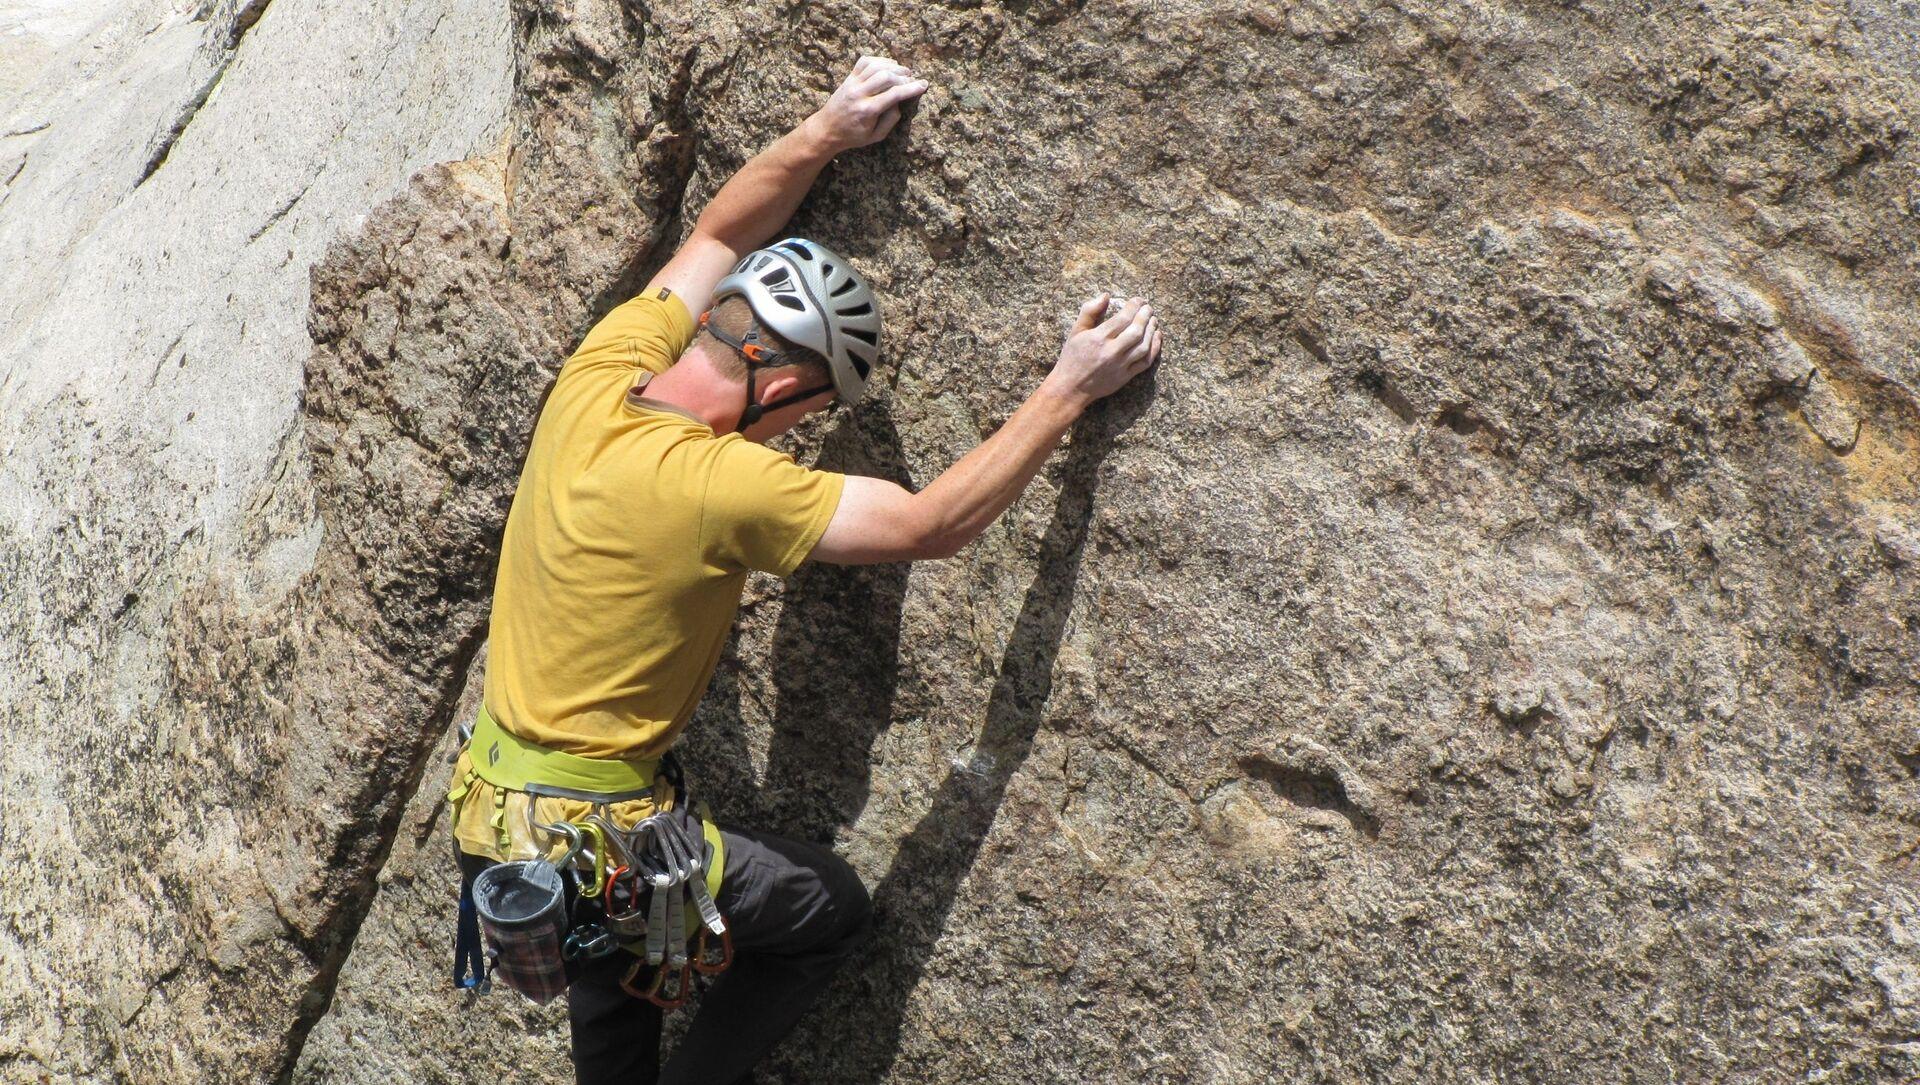 Freeclimbing, arrampicata, parete rocciosa - Sputnik Italia, 1920, 28.02.2021